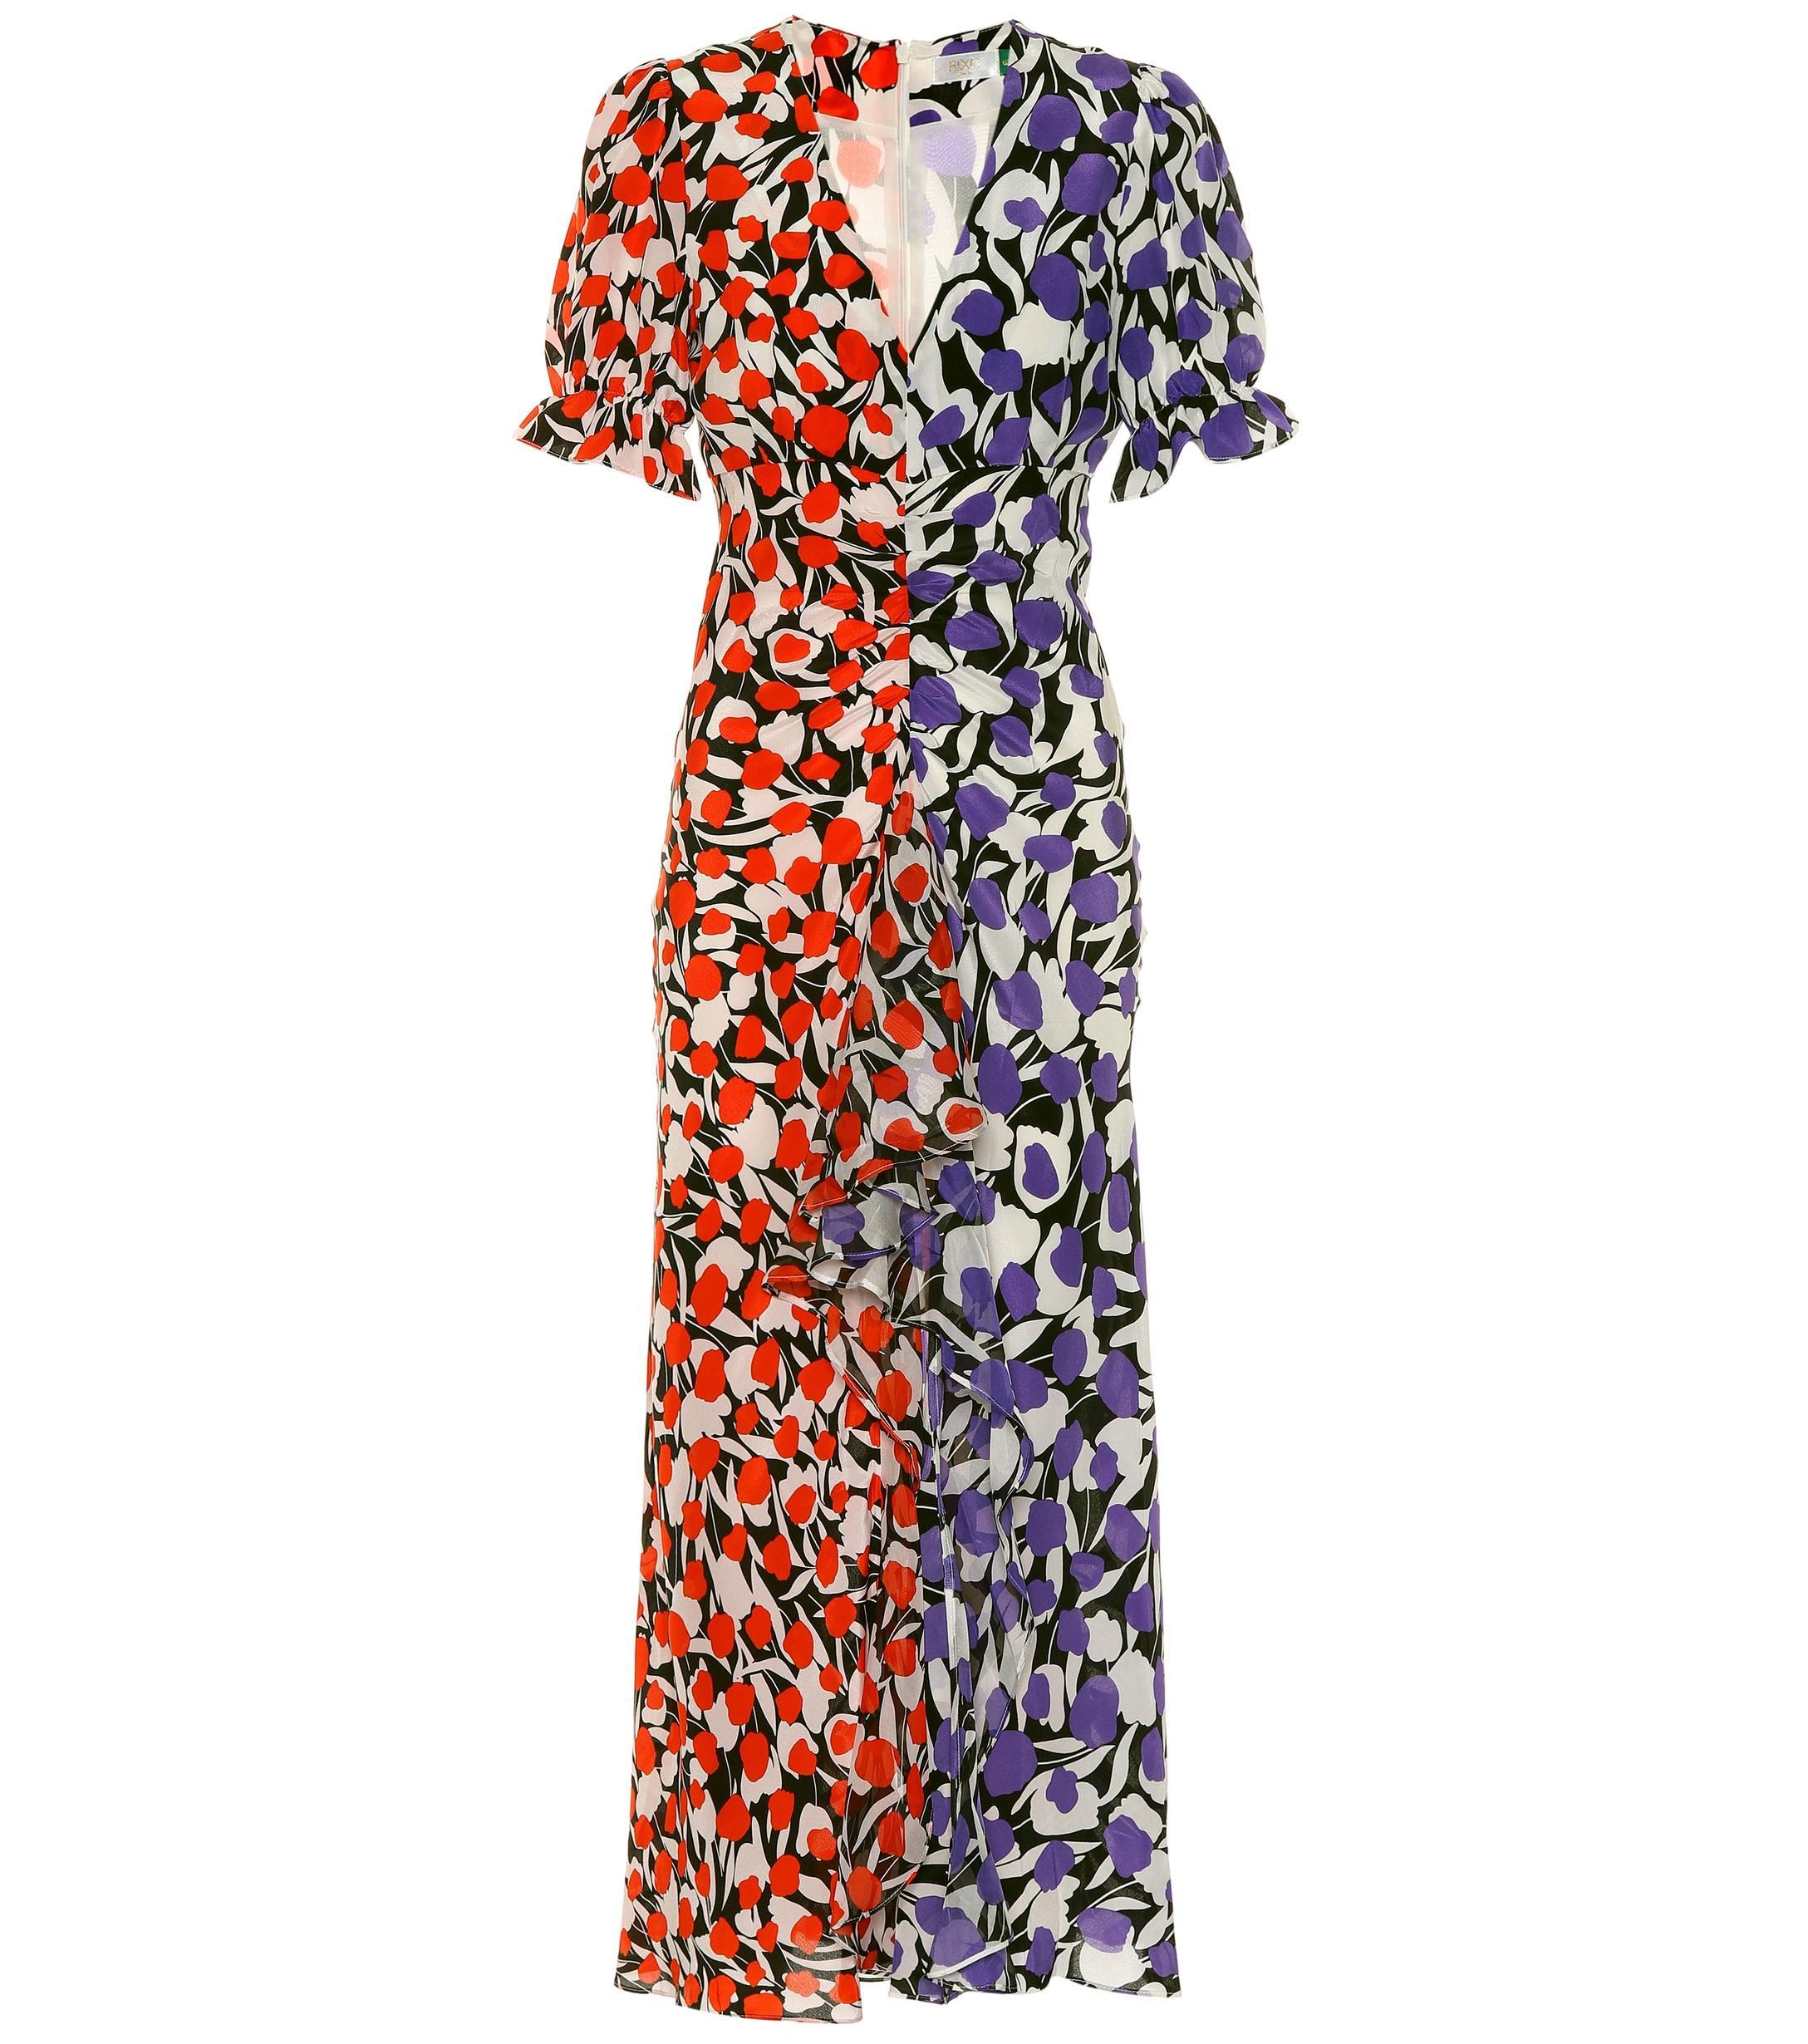 9376c149ee Lyst - RIXO London Ariel Printed Silk Maxi Dress in Red